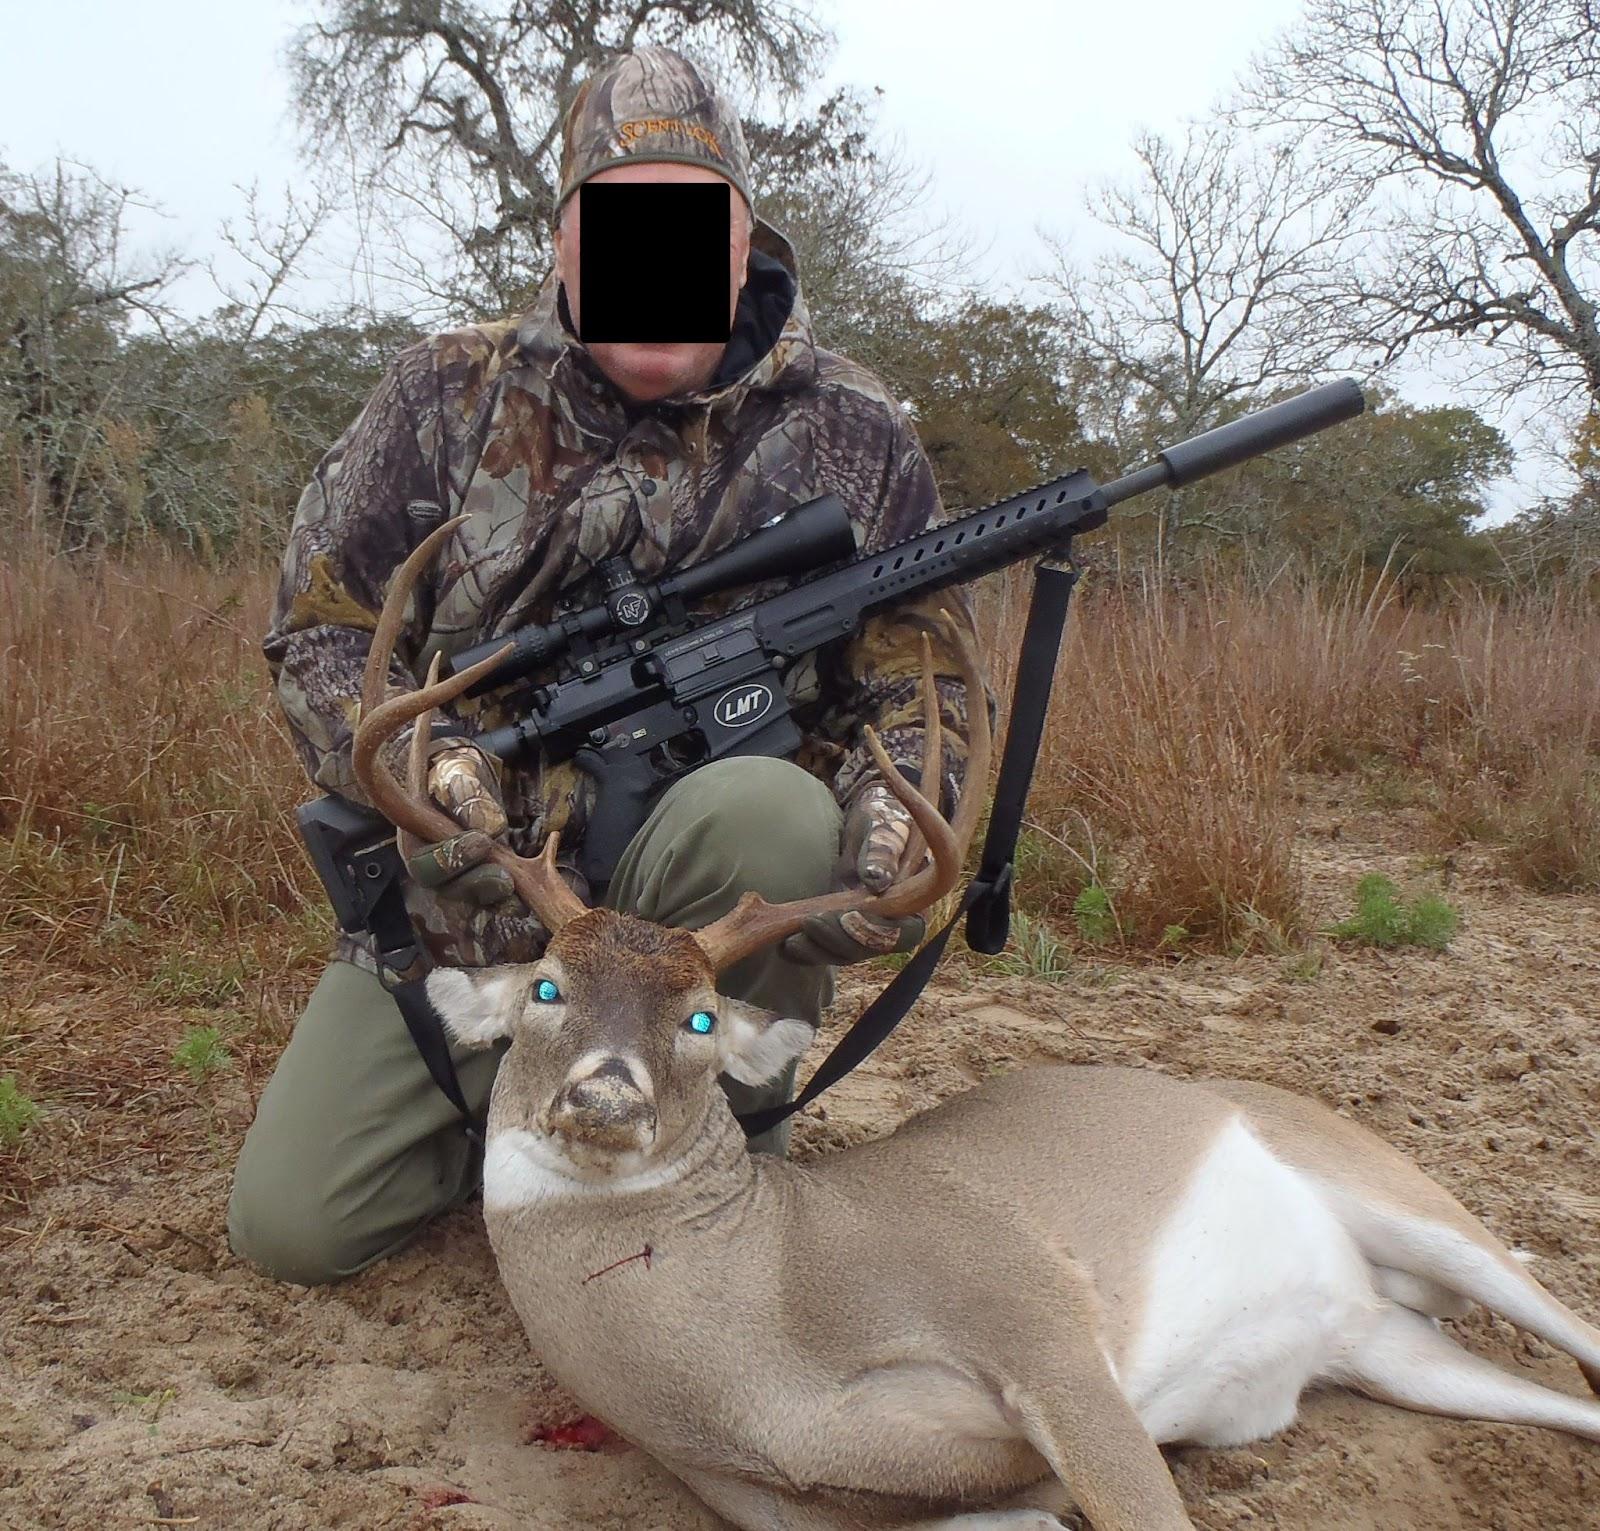 AR-10 LMT Rifle hunter